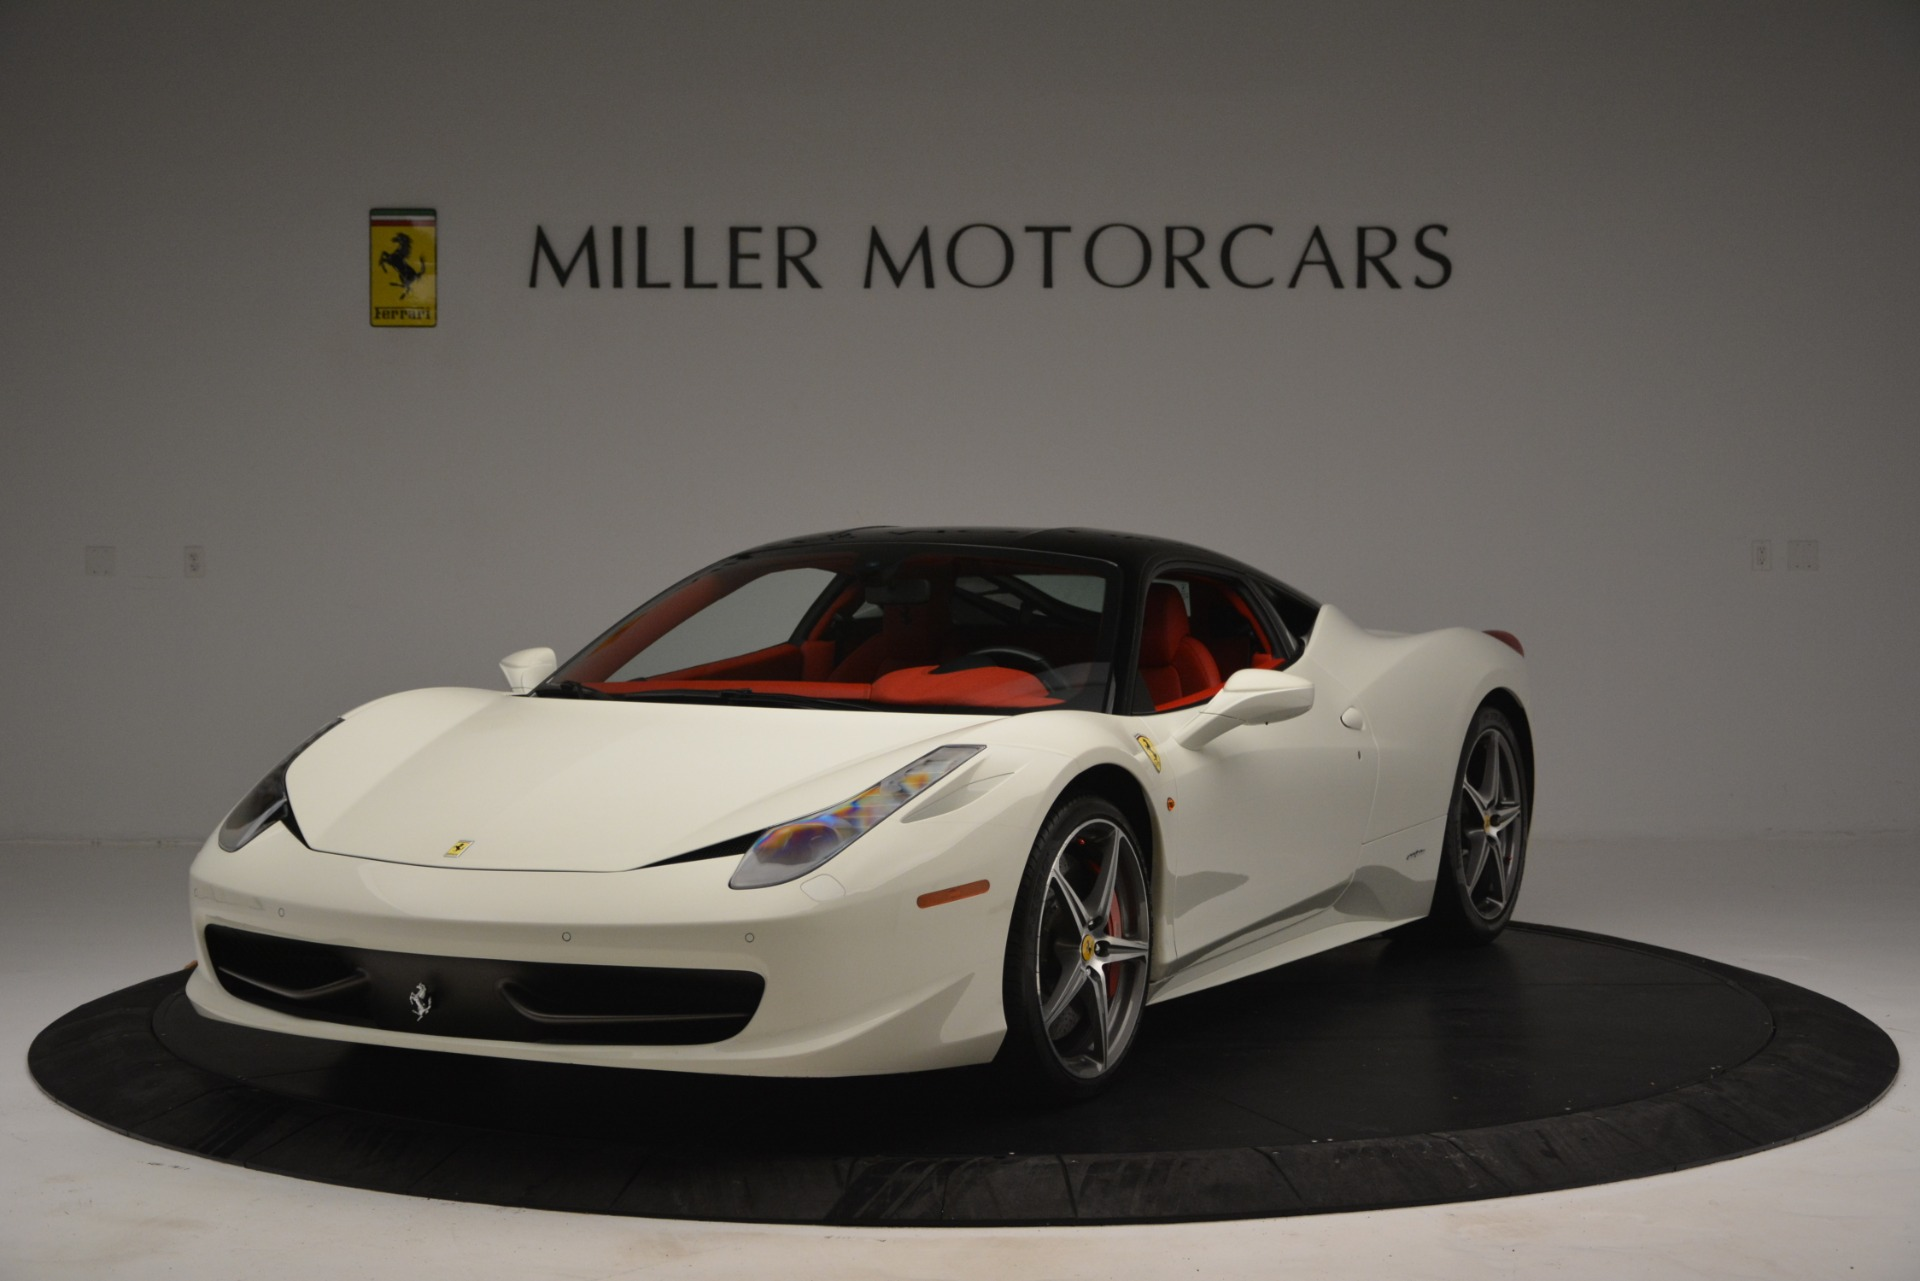 Used 2012 Ferrari 458 Italia for sale Sold at Pagani of Greenwich in Greenwich CT 06830 1